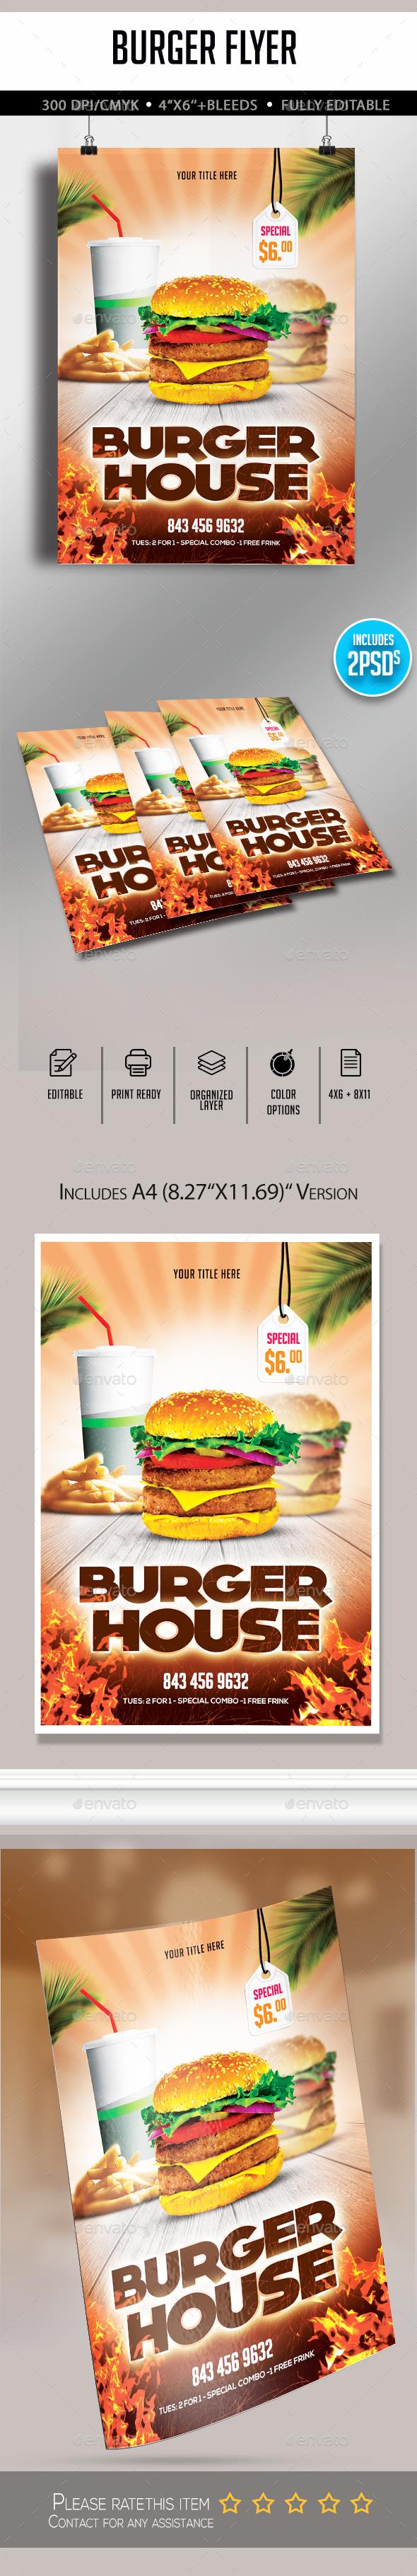 Burger Flyer - Restaurant Flyers